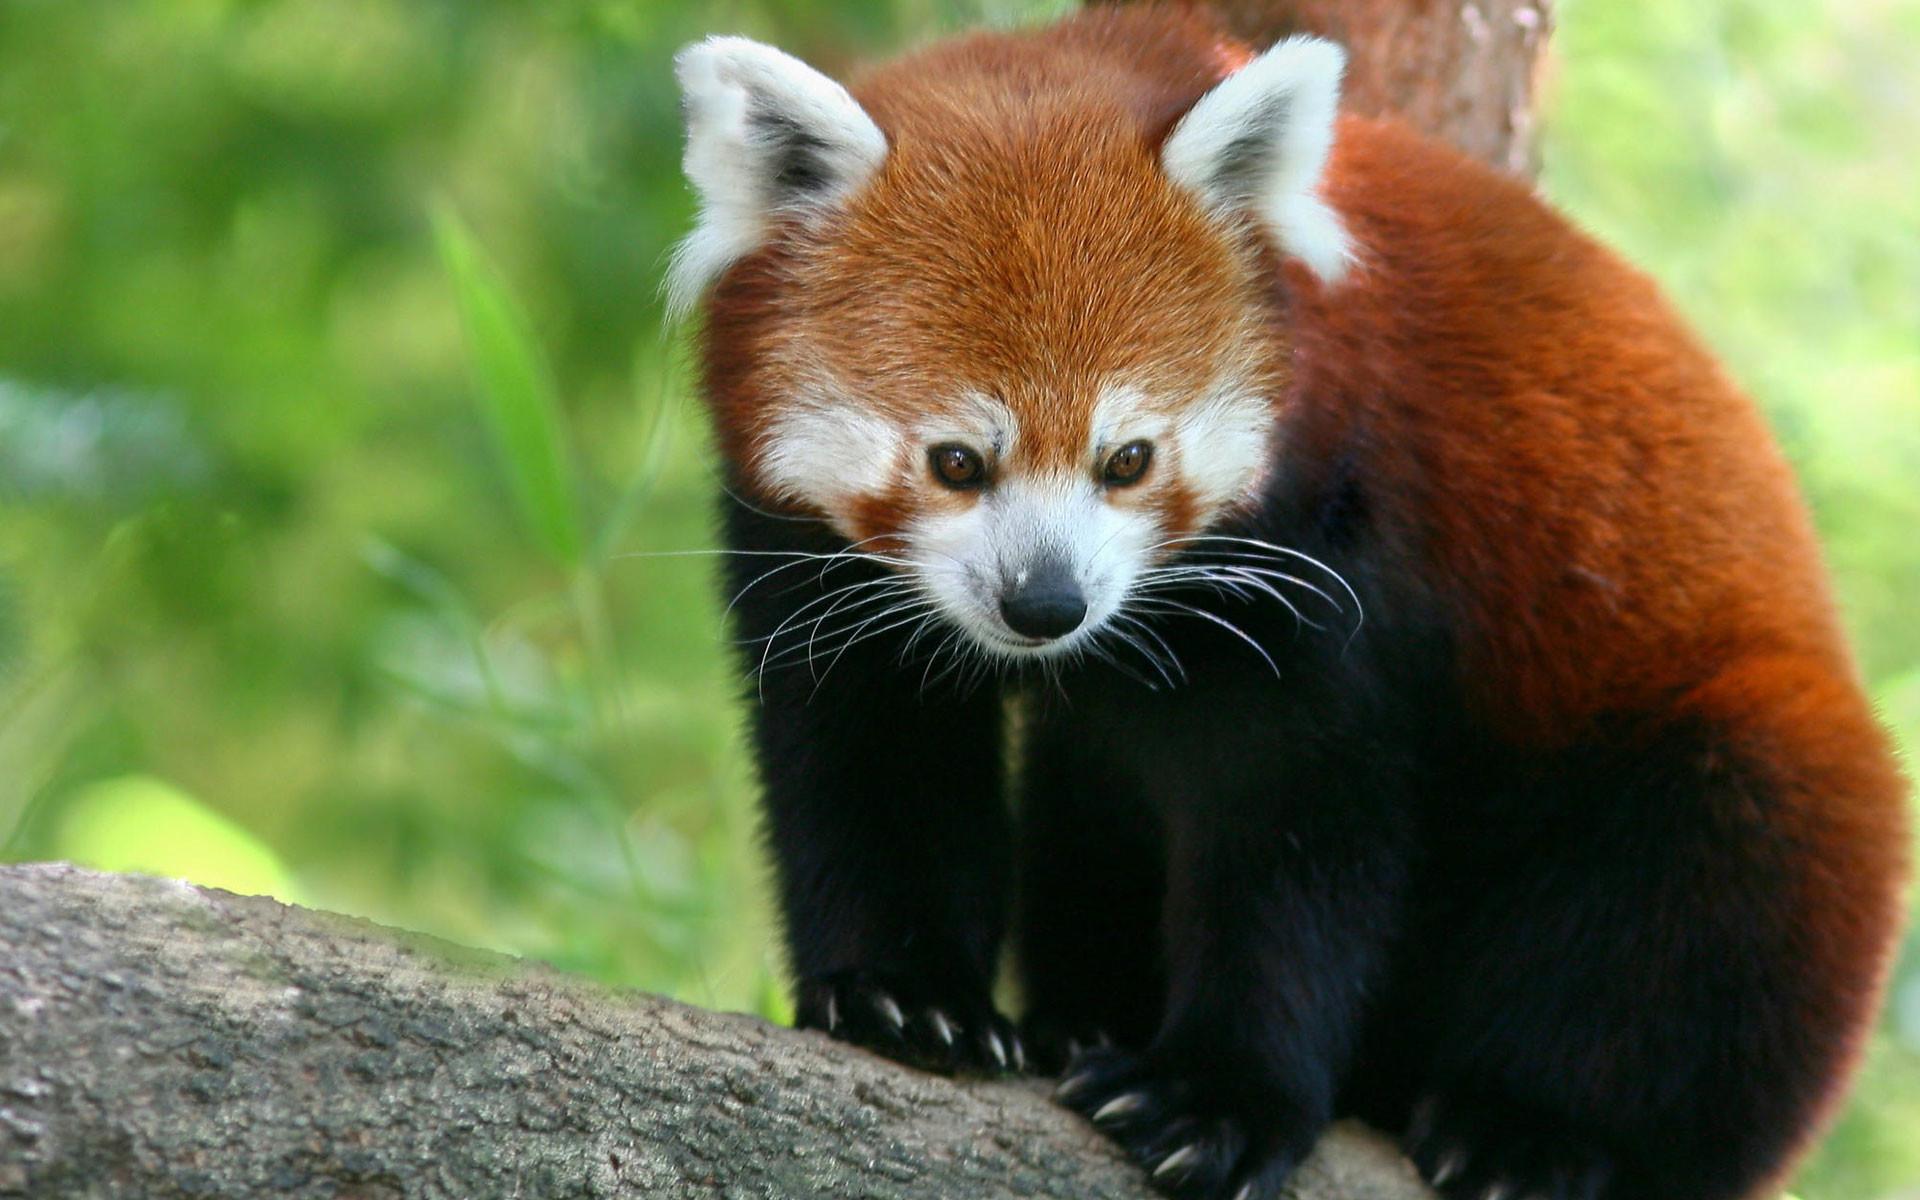 Red Panda Wallpapers | HD Wallpapers